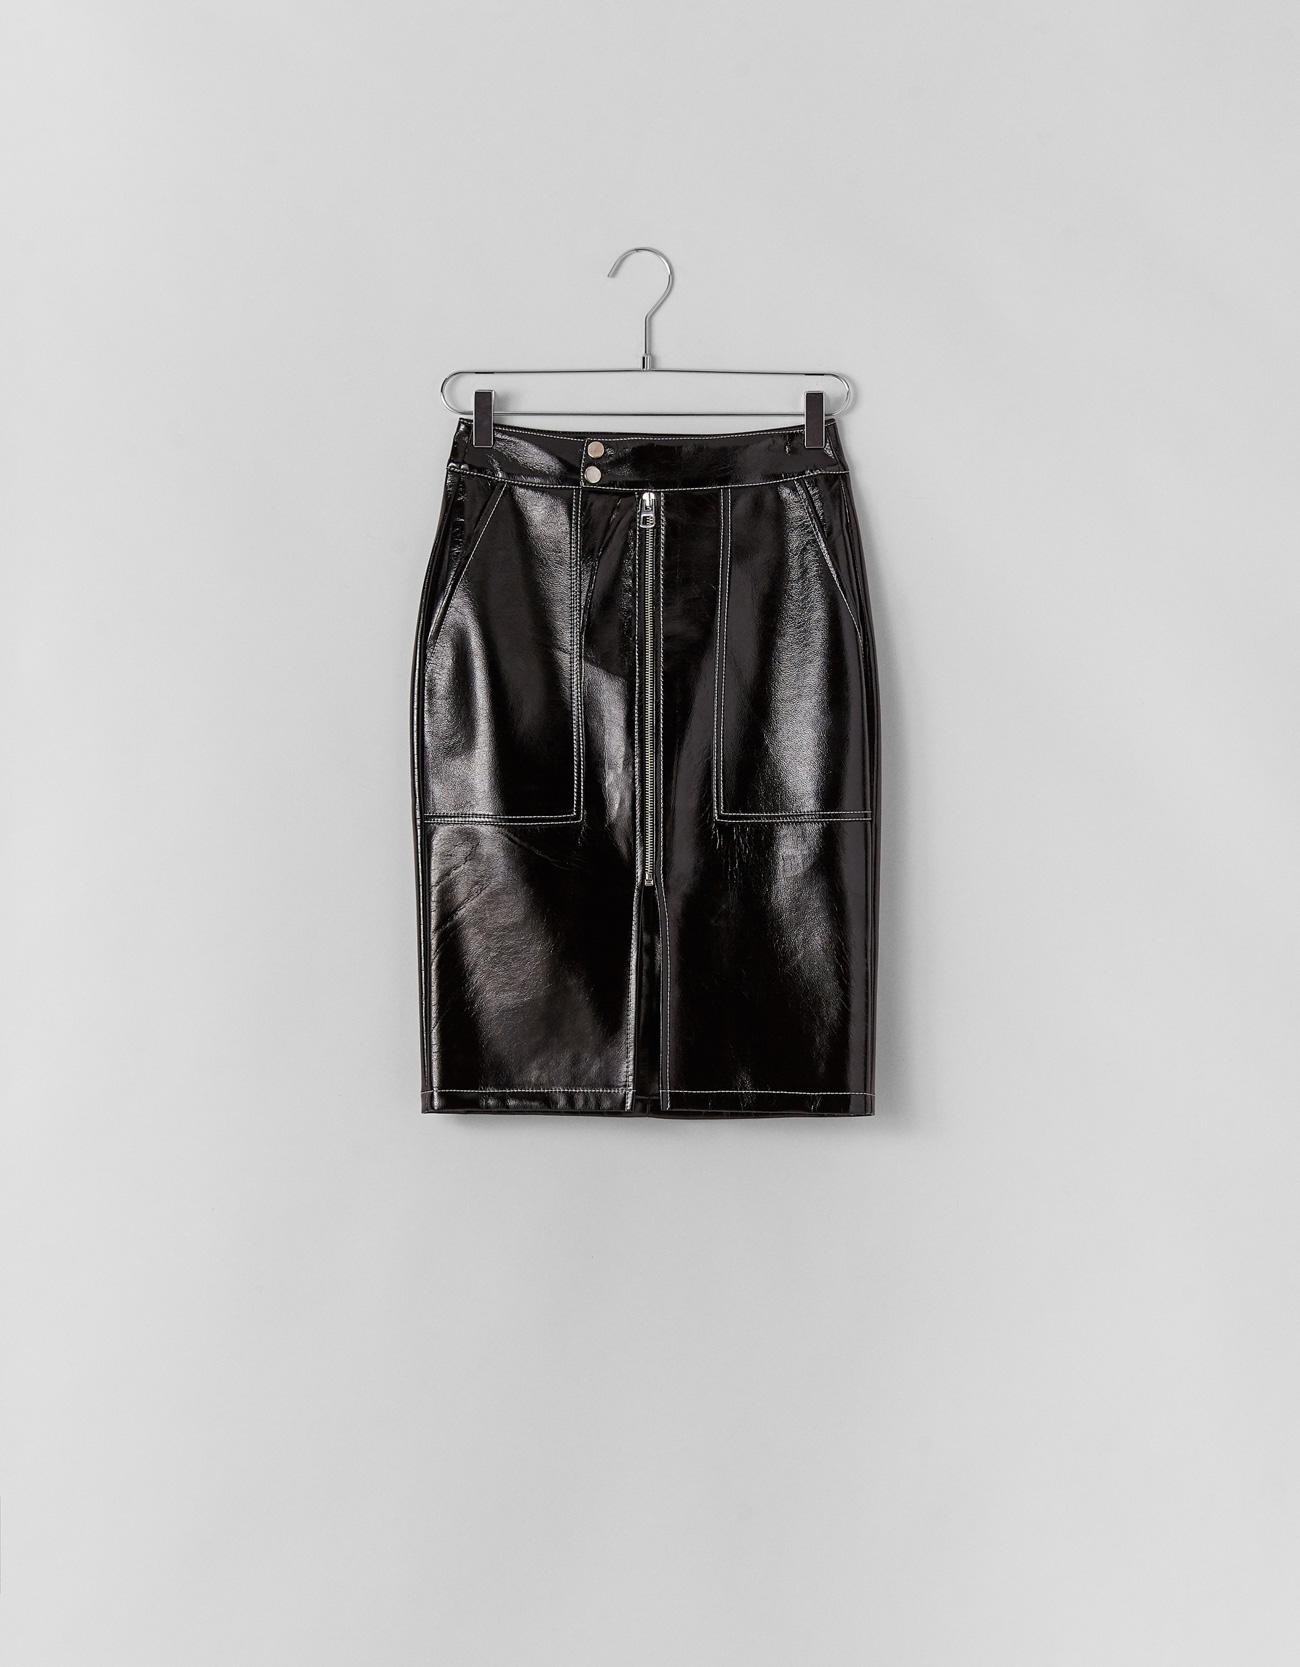 4f93ef85ca49 Vinyl-effect midi skirt - Plain - Bershka Hong Kong SAR / 香港特別行政區